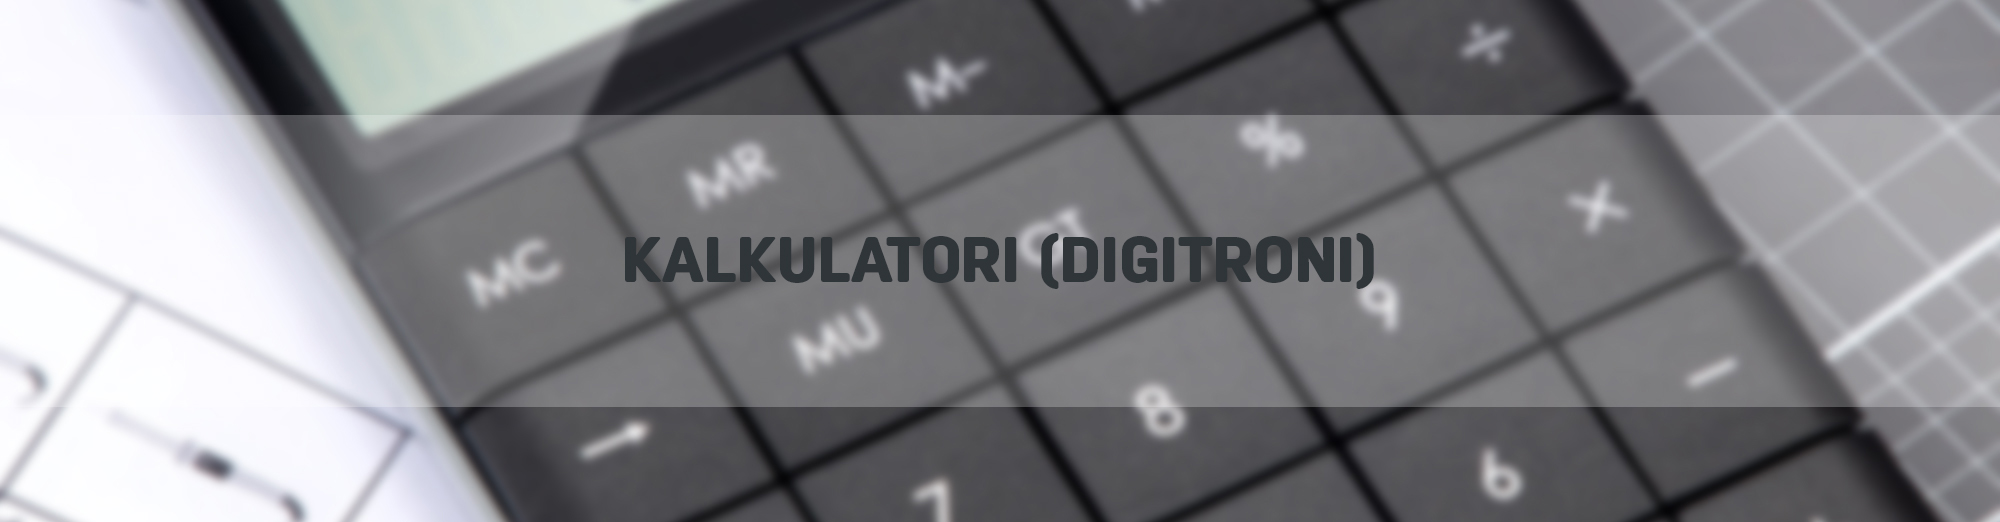 Kalkulatori (digitroni)